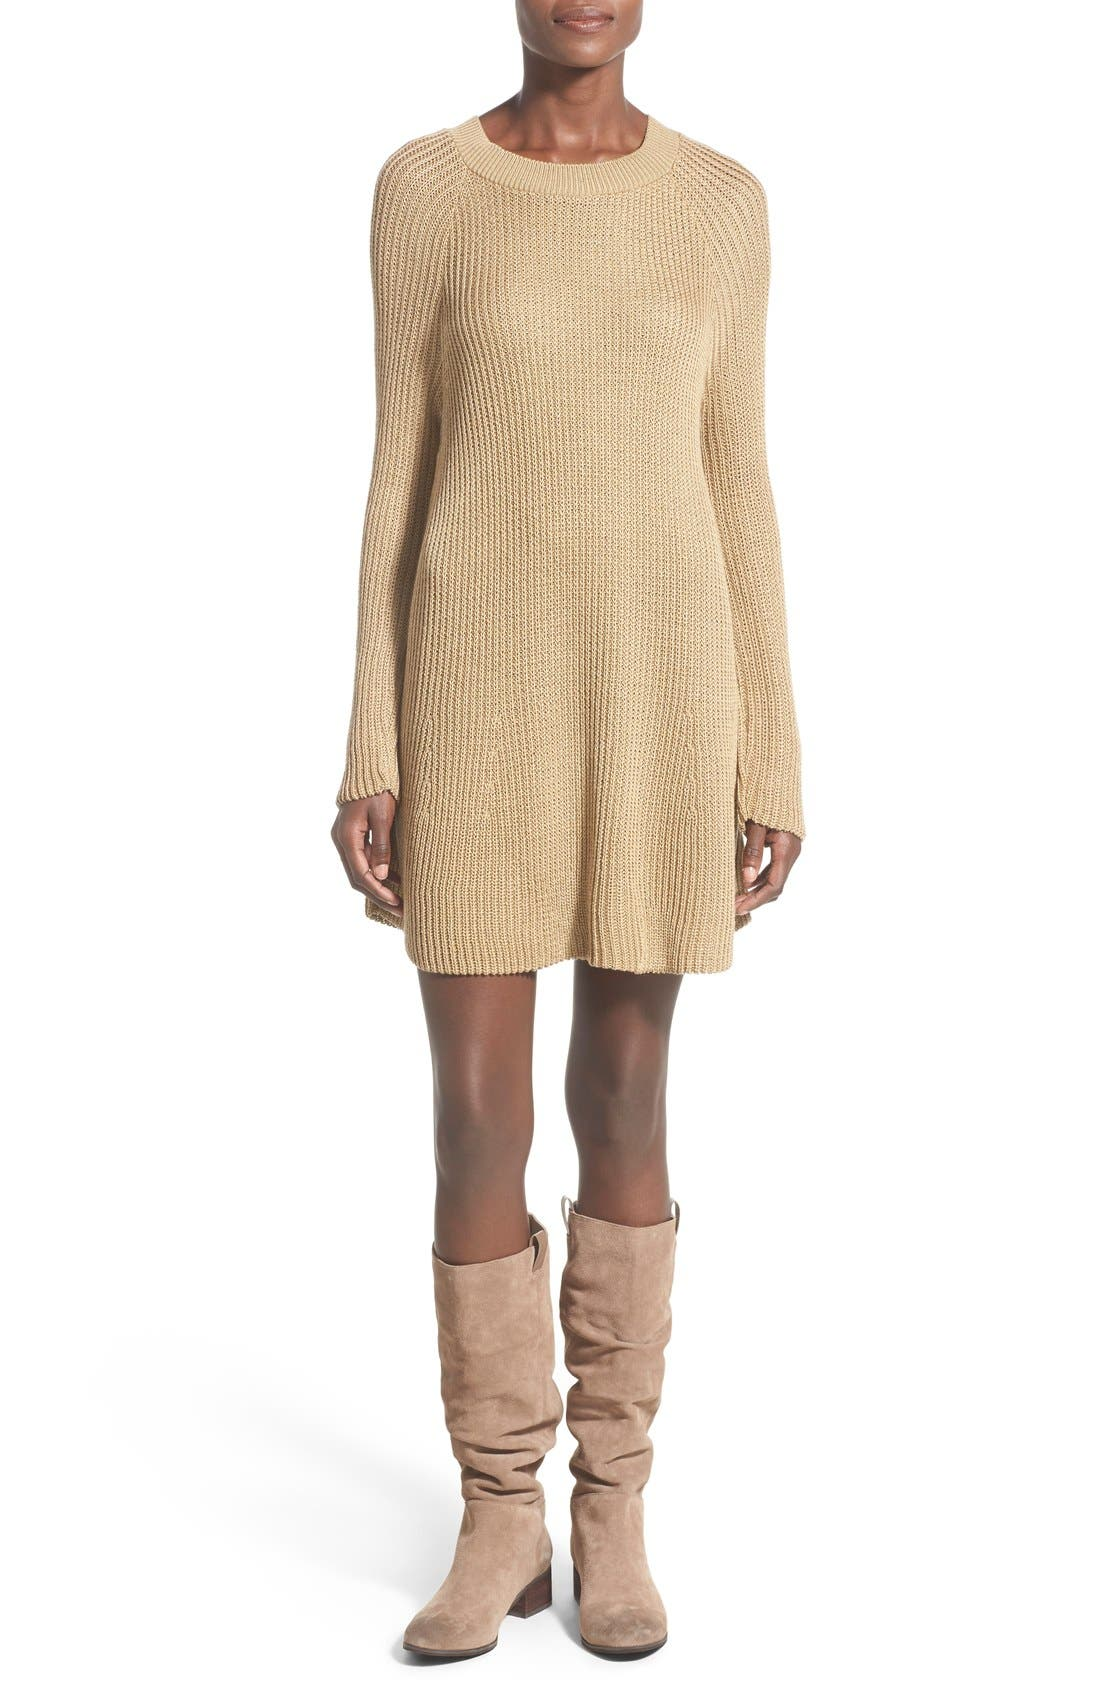 Main Image - Cotton Emporium Crewneck Sweater Dress